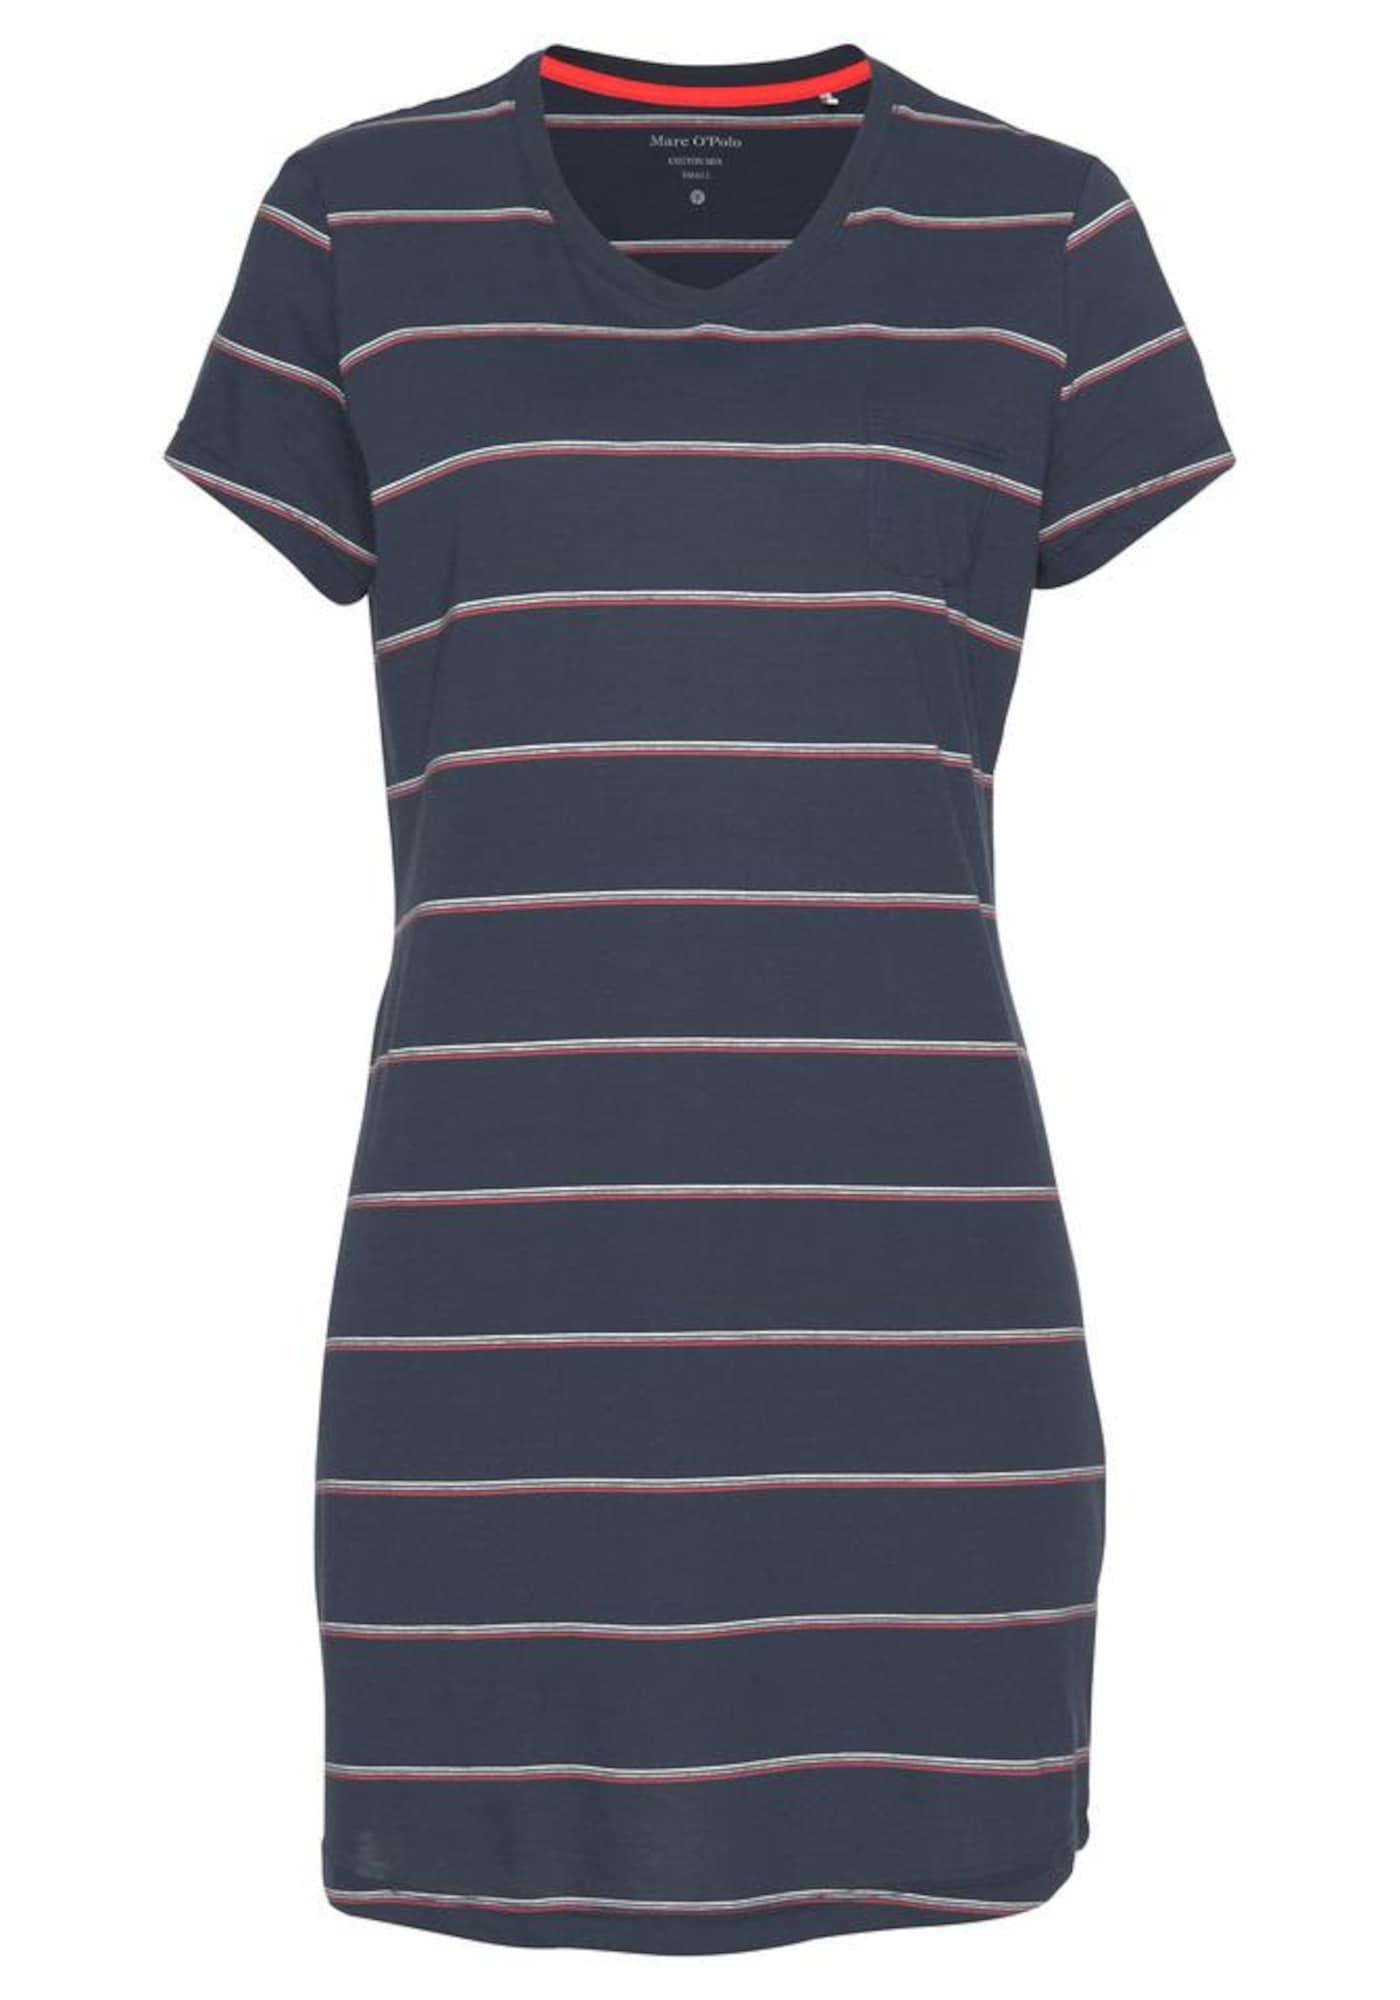 Sleepshirt | Bekleidung > Nachtwäsche > Sleepshirts | Rot - Weiß | Marc O'Polo